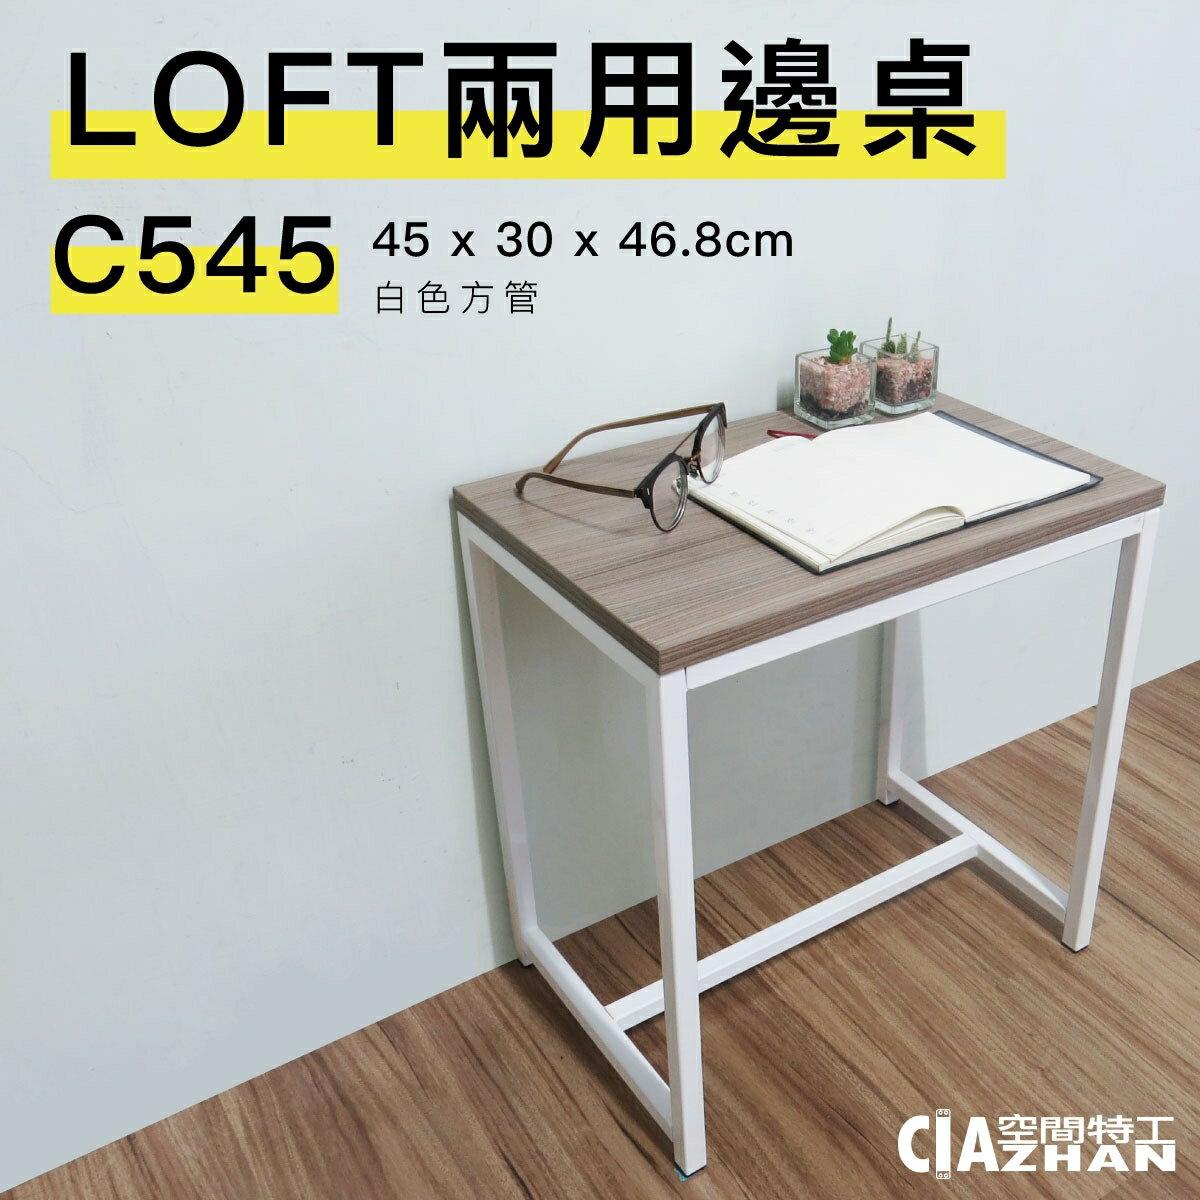 LOFT兩用邊桌(45x30x46.8cm)皓雪白 方管椅 茶几 邊桌 工業風 床頭櫃 吧台椅  STW545 空間特工